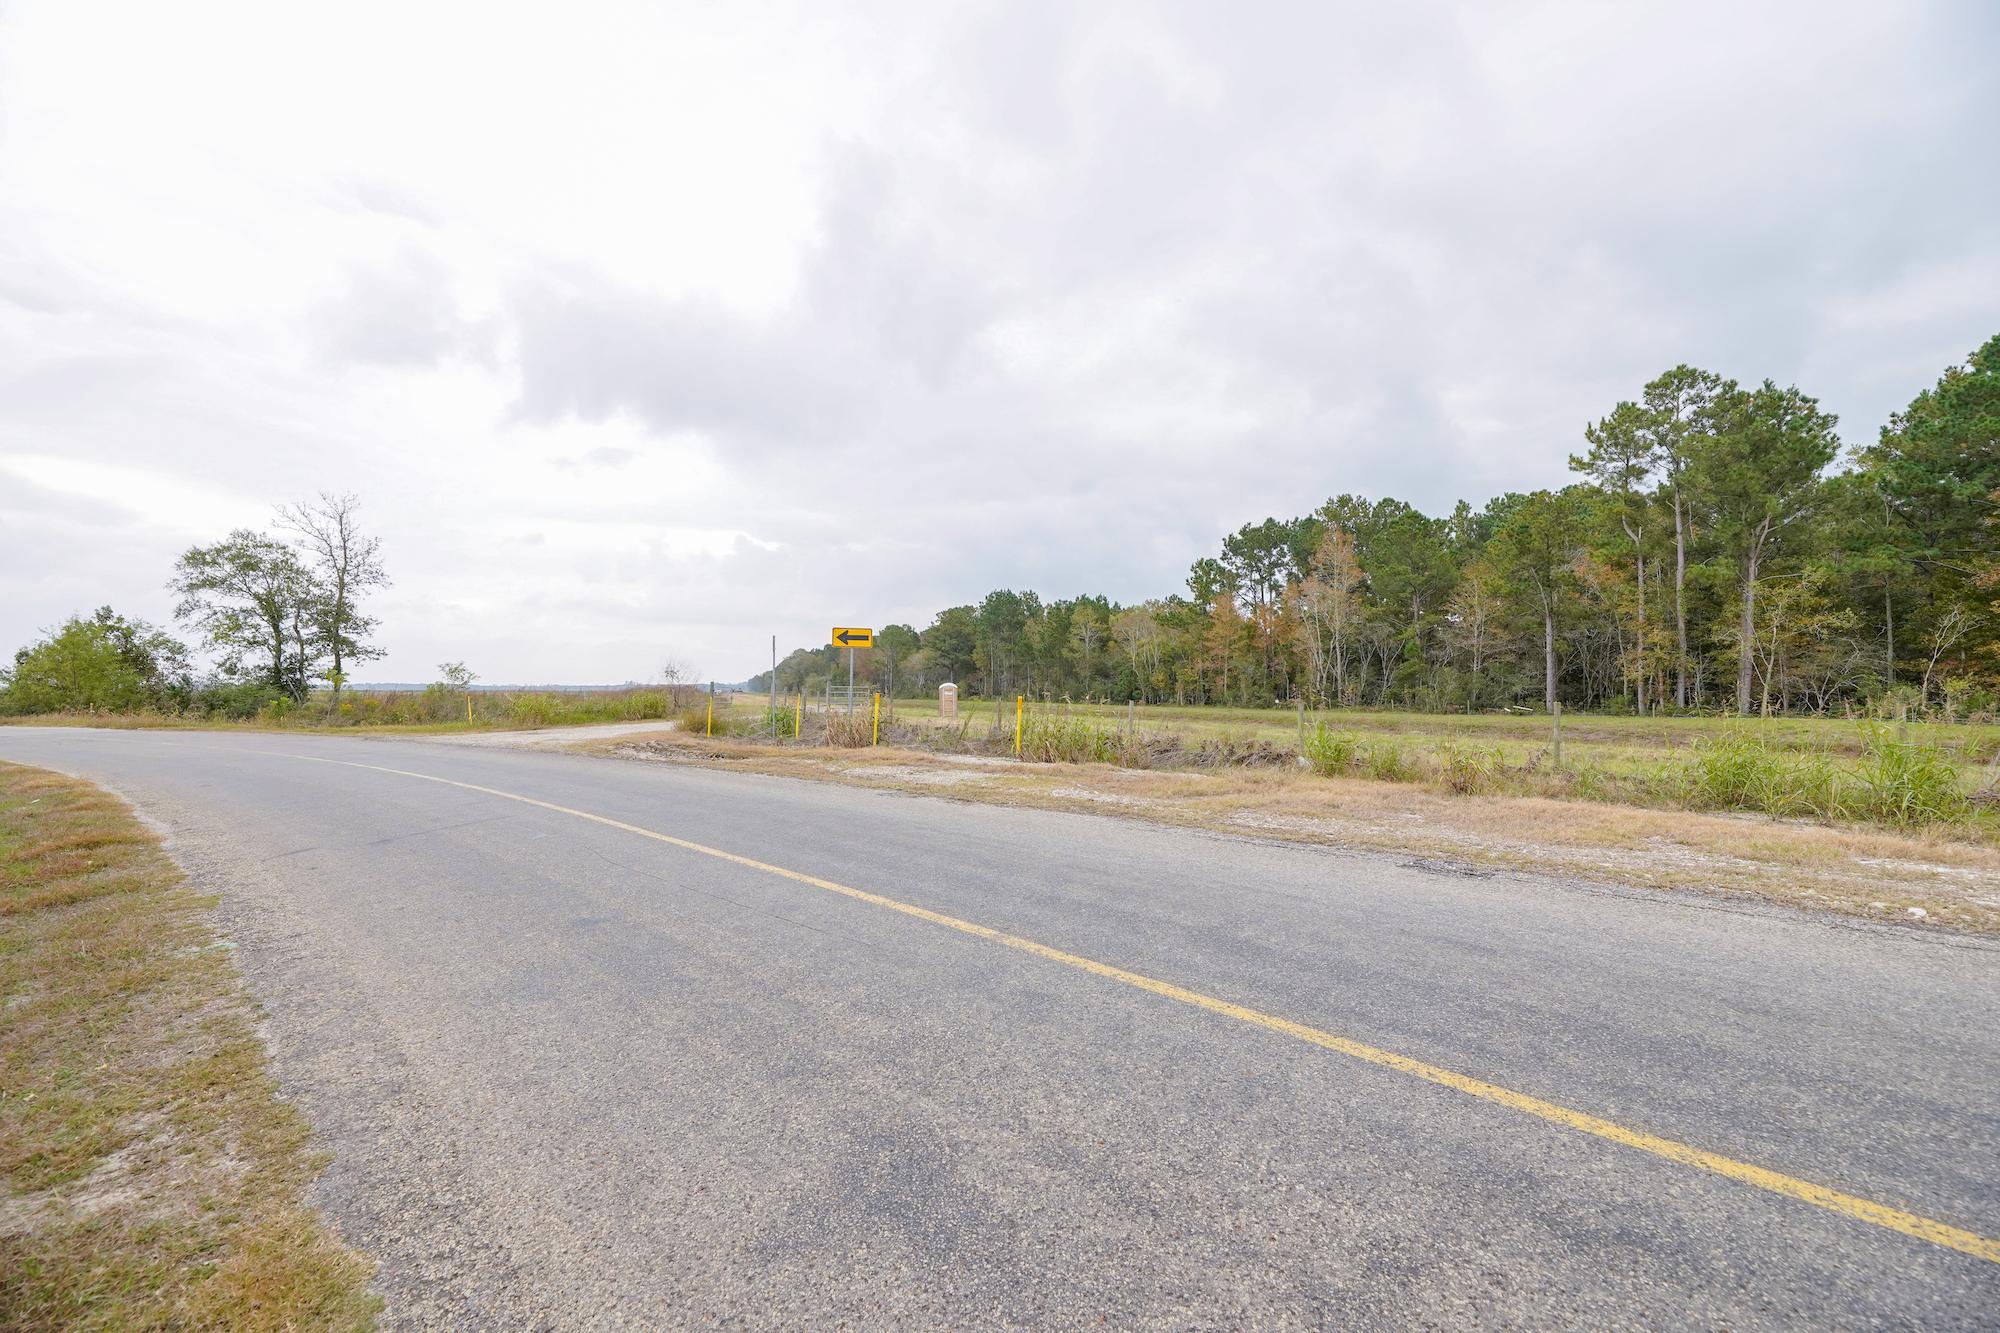 Jefferson County Development Land - Image 6 of 36